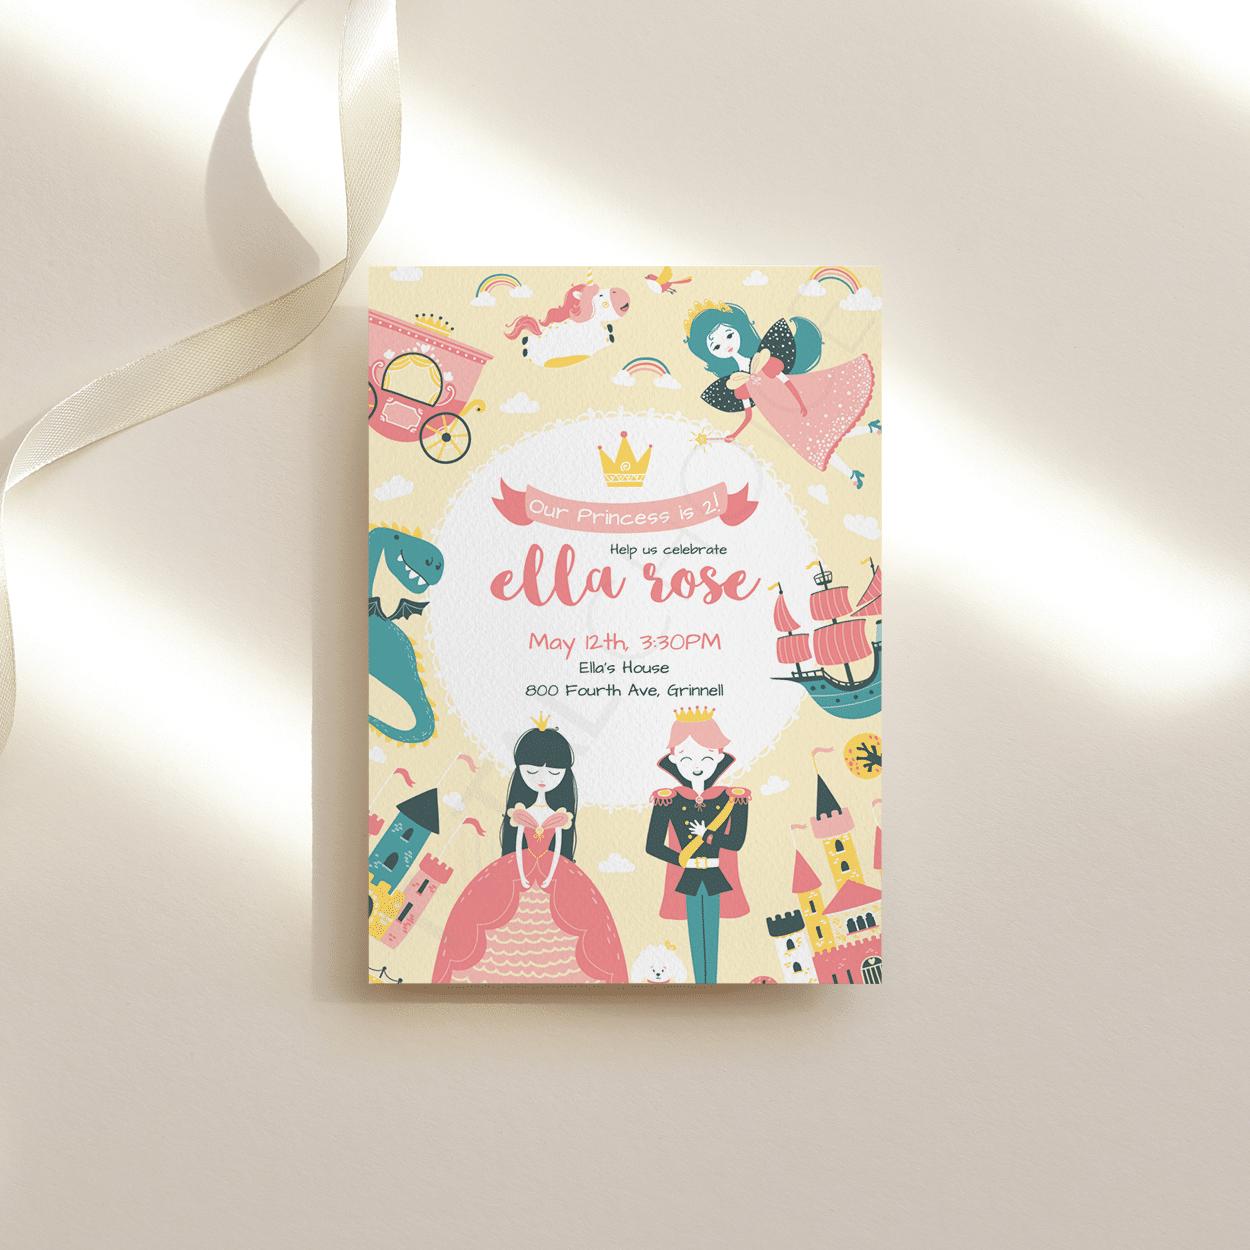 Prince and Princess Birthday Invitation